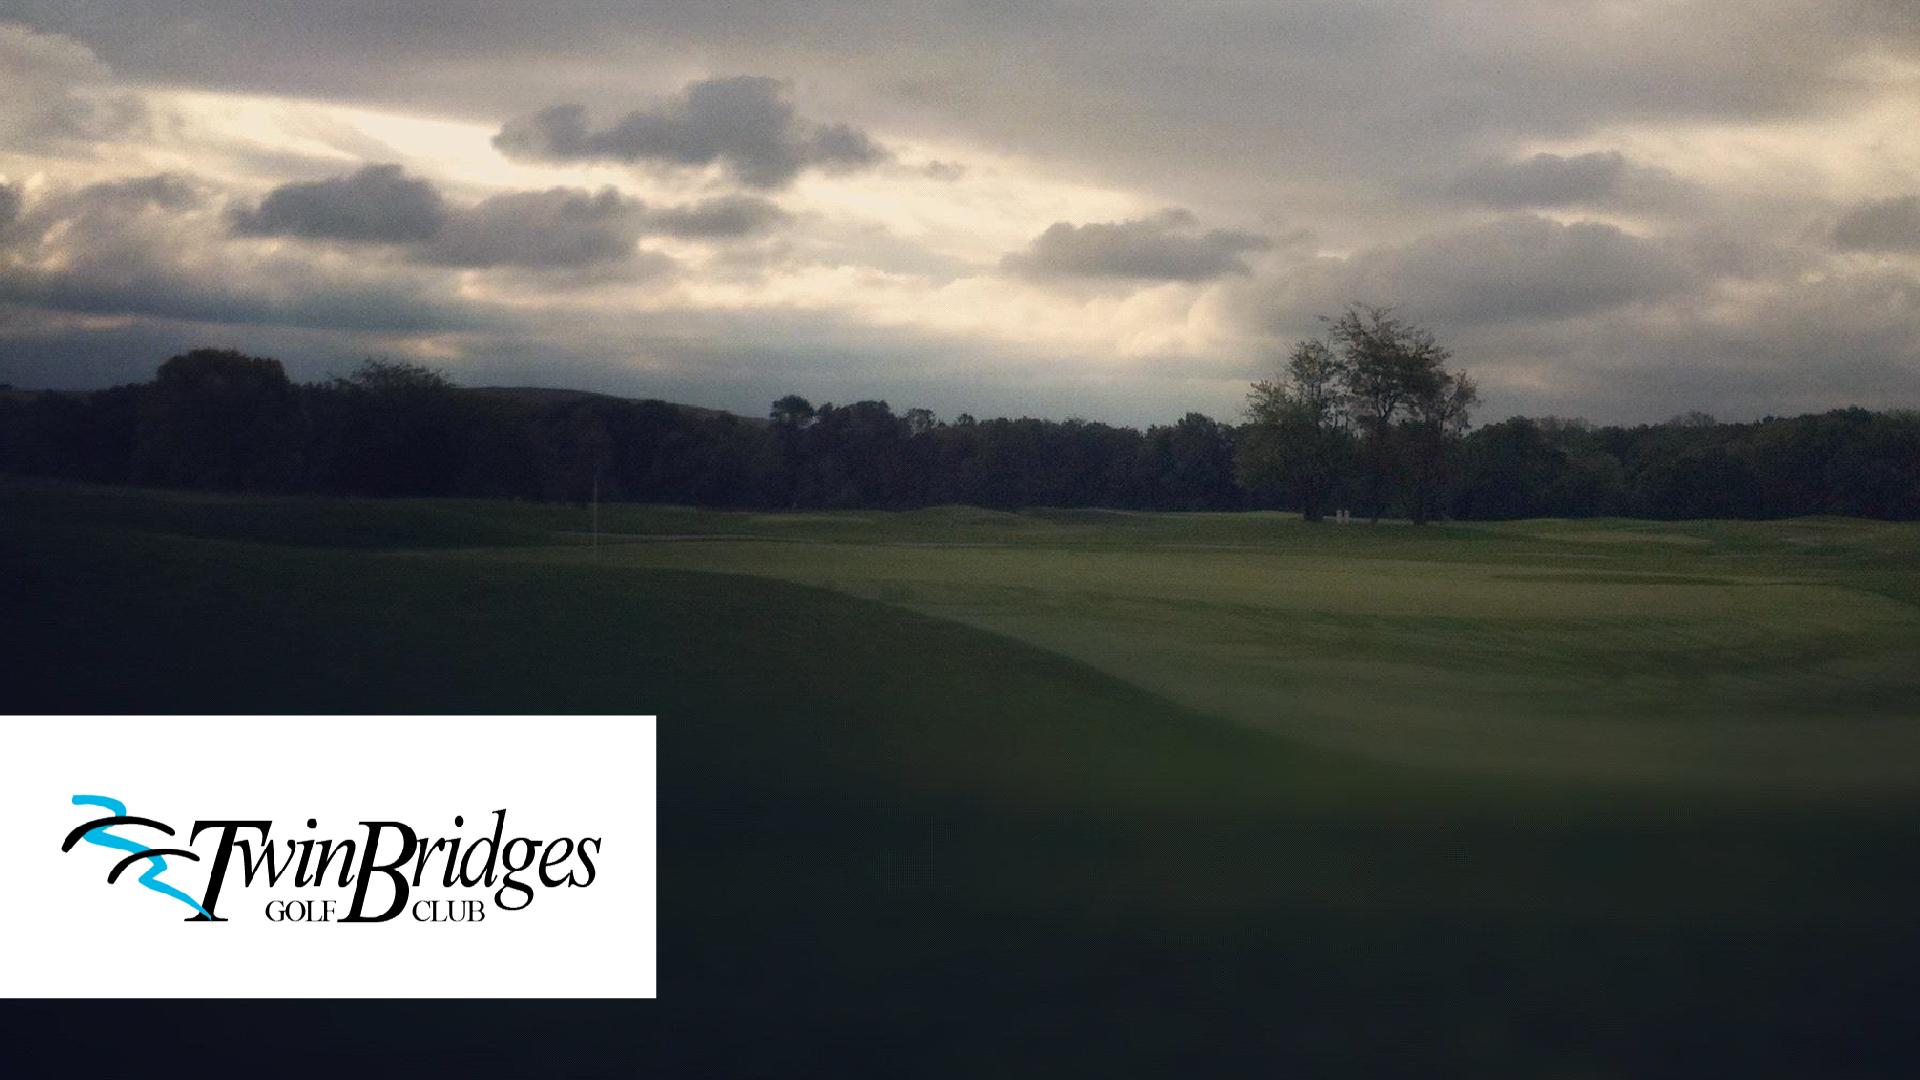 Twin-Bridges-Golf-Club-Green-Golf-Partners